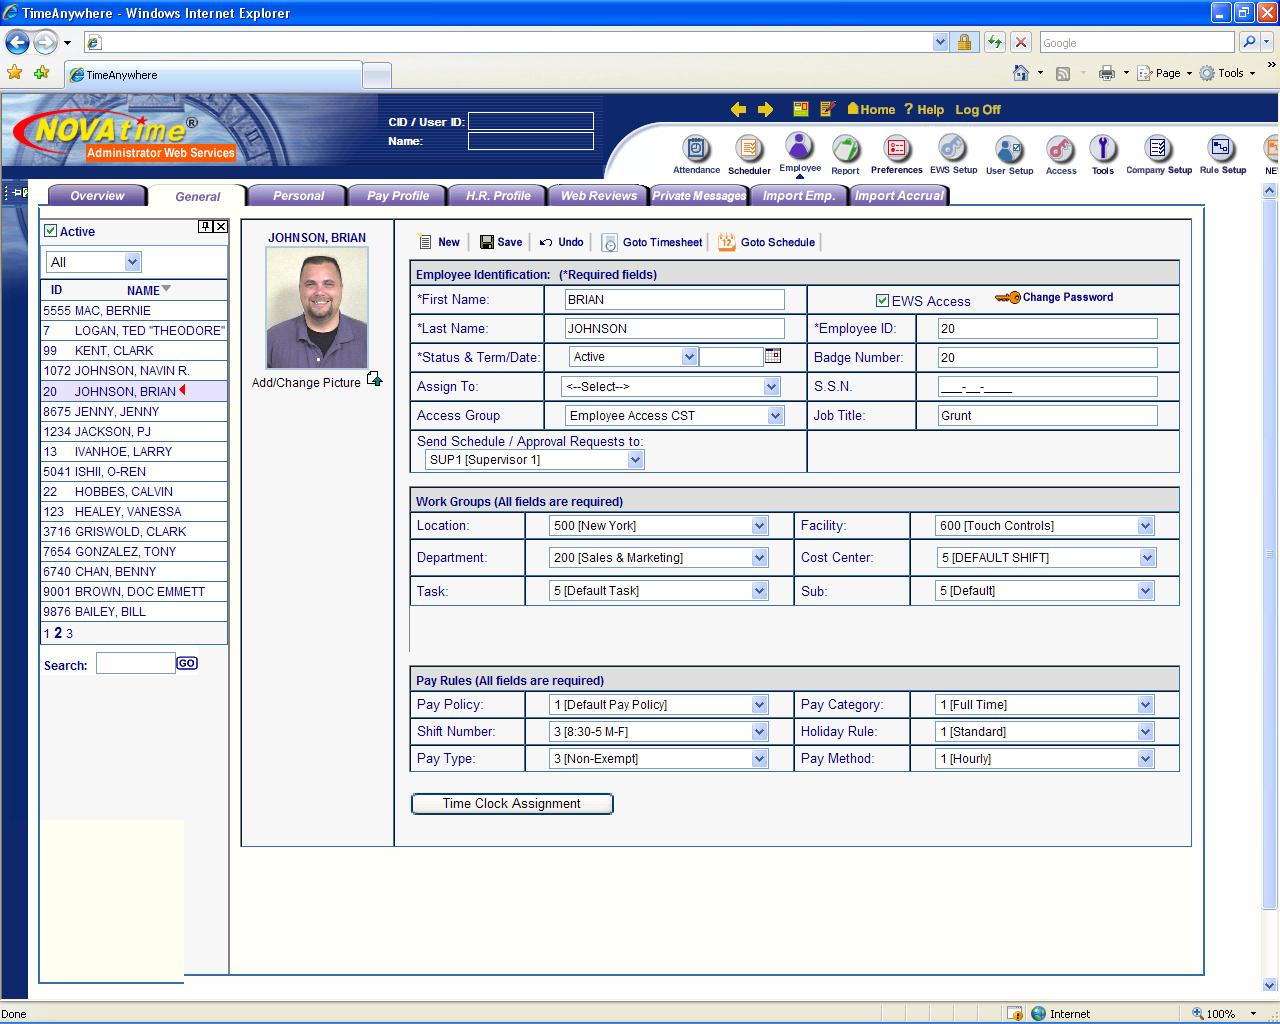 Novatime 4000 Web Time And Attendance System - Time Clocks